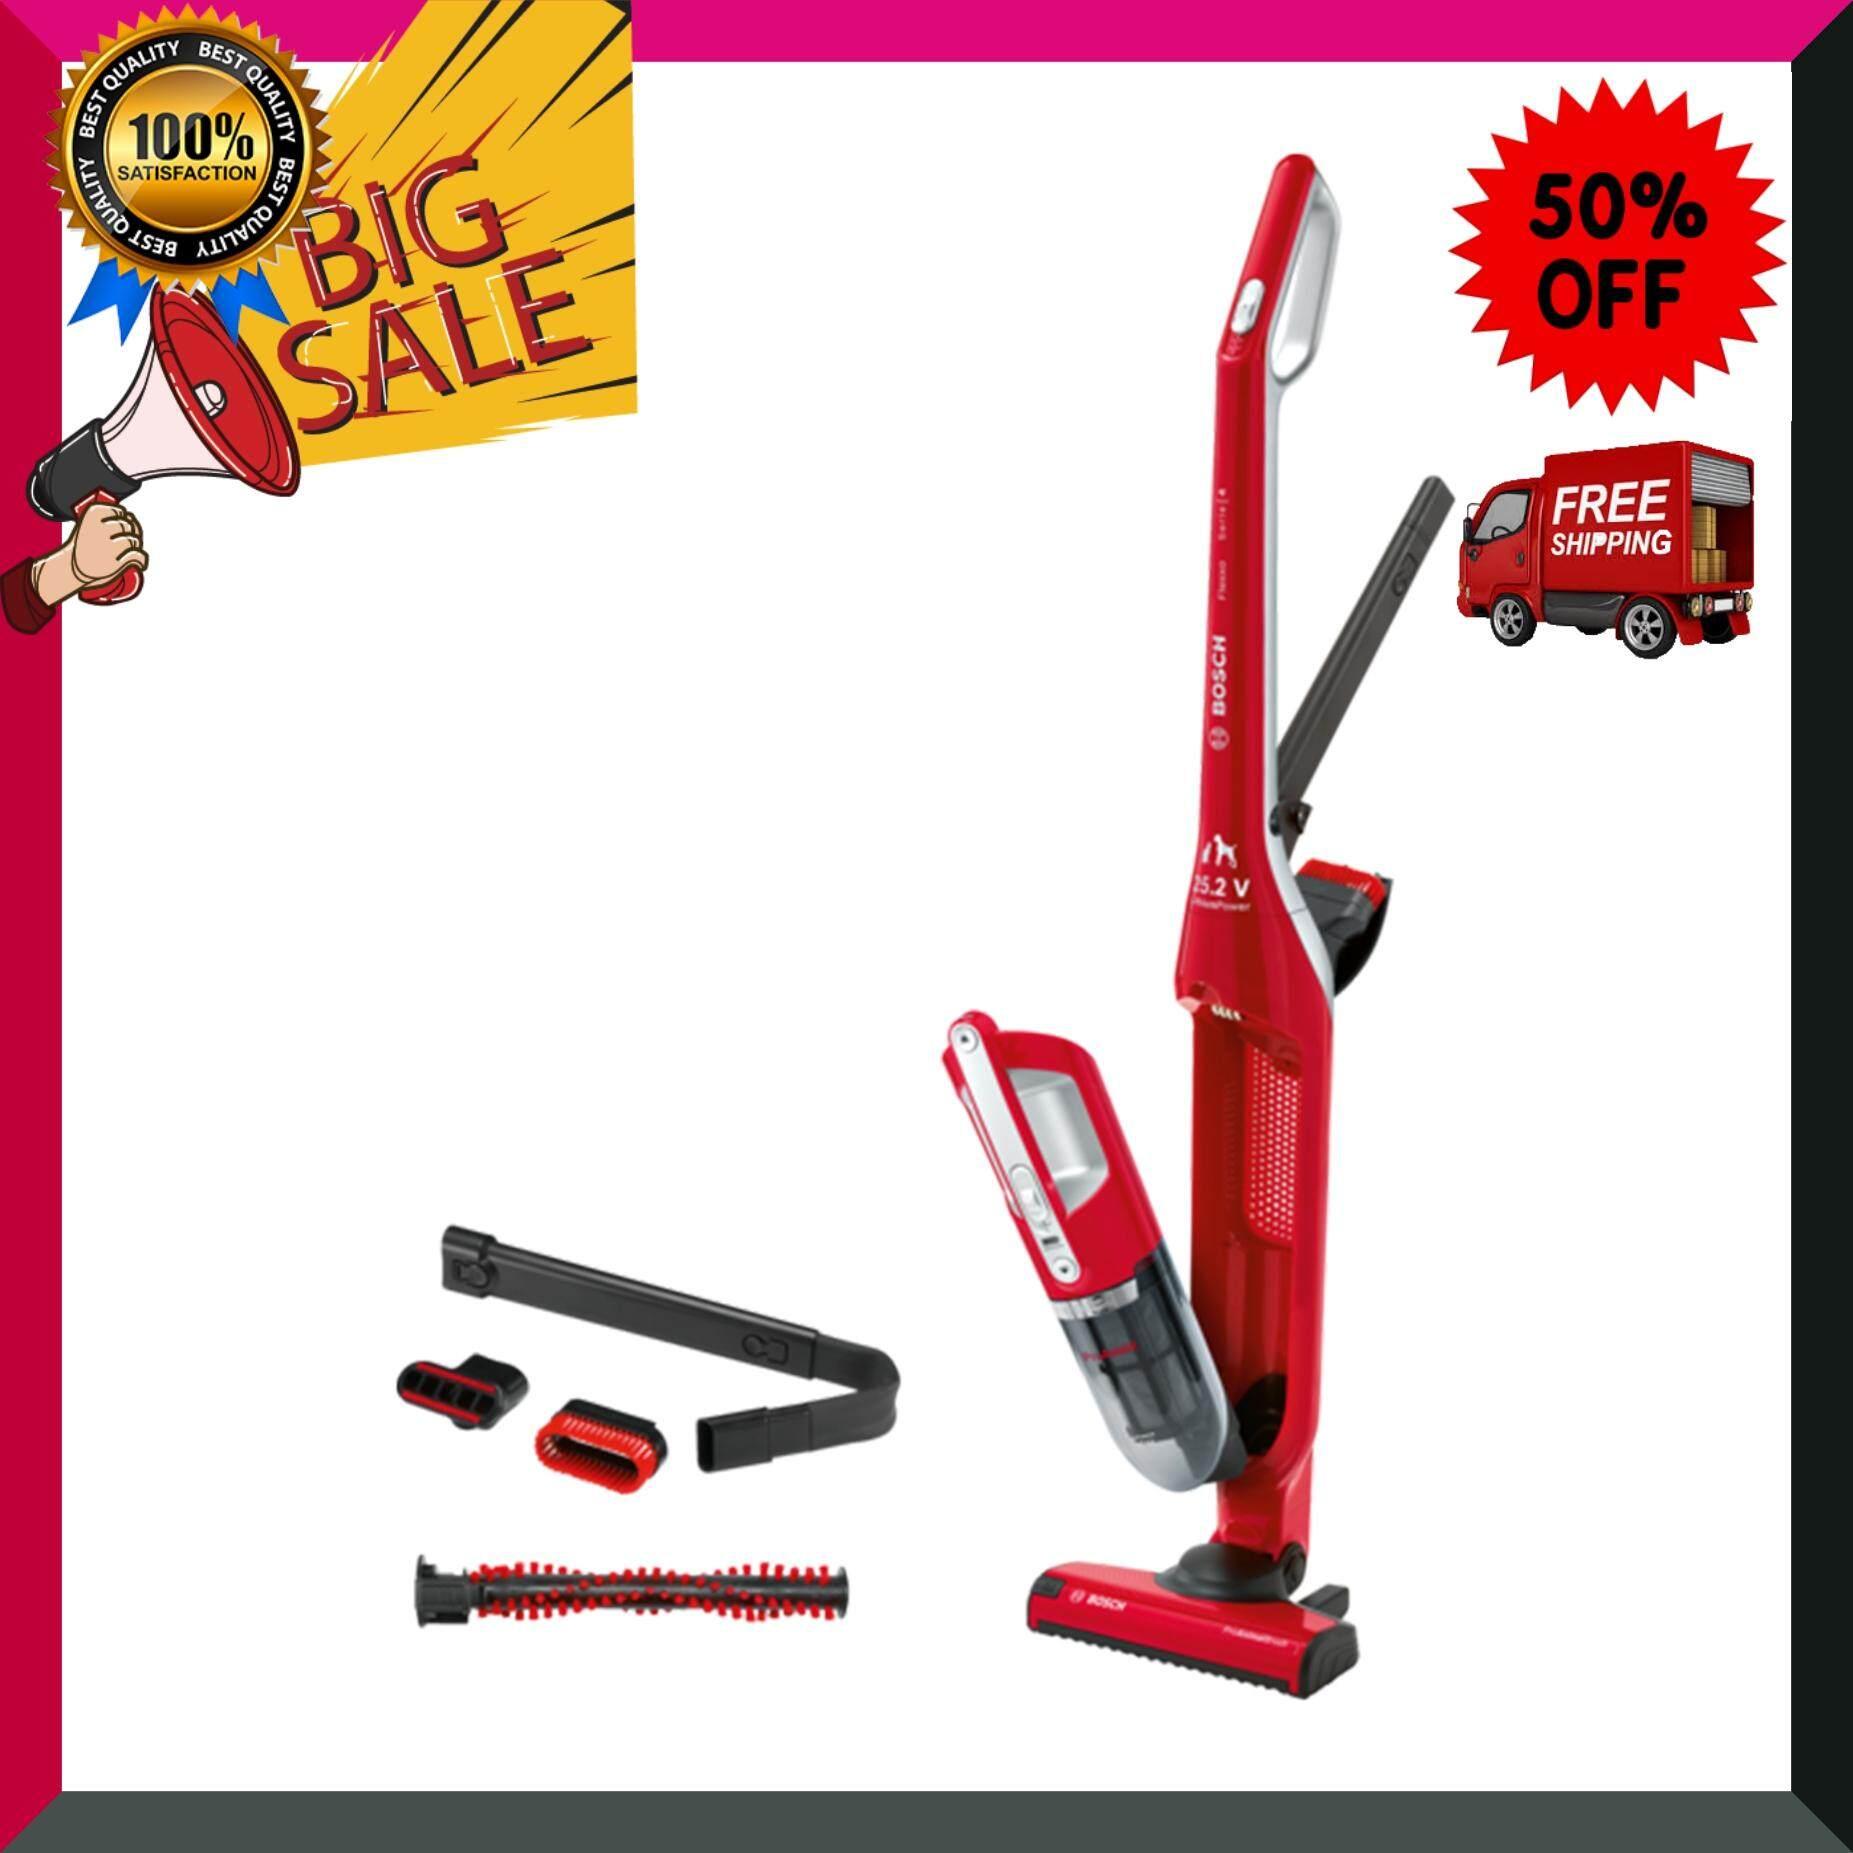 BOSCH เครื่องดูดฝุ่นไร้สาย 2 in 1 Flexxo ProAnimal รุ่น BBH3ZOO25 สีแดง เครื่องดูดฝุ่น เครื่องทำความสะอาด เครื่องดูดฝุ่นอัตโนมัติ หุ่นยนต์ดูดฝุ่น Vacuum Cleaner สินค้าคุณภาพ Premium ***จัดส่งฟรี***